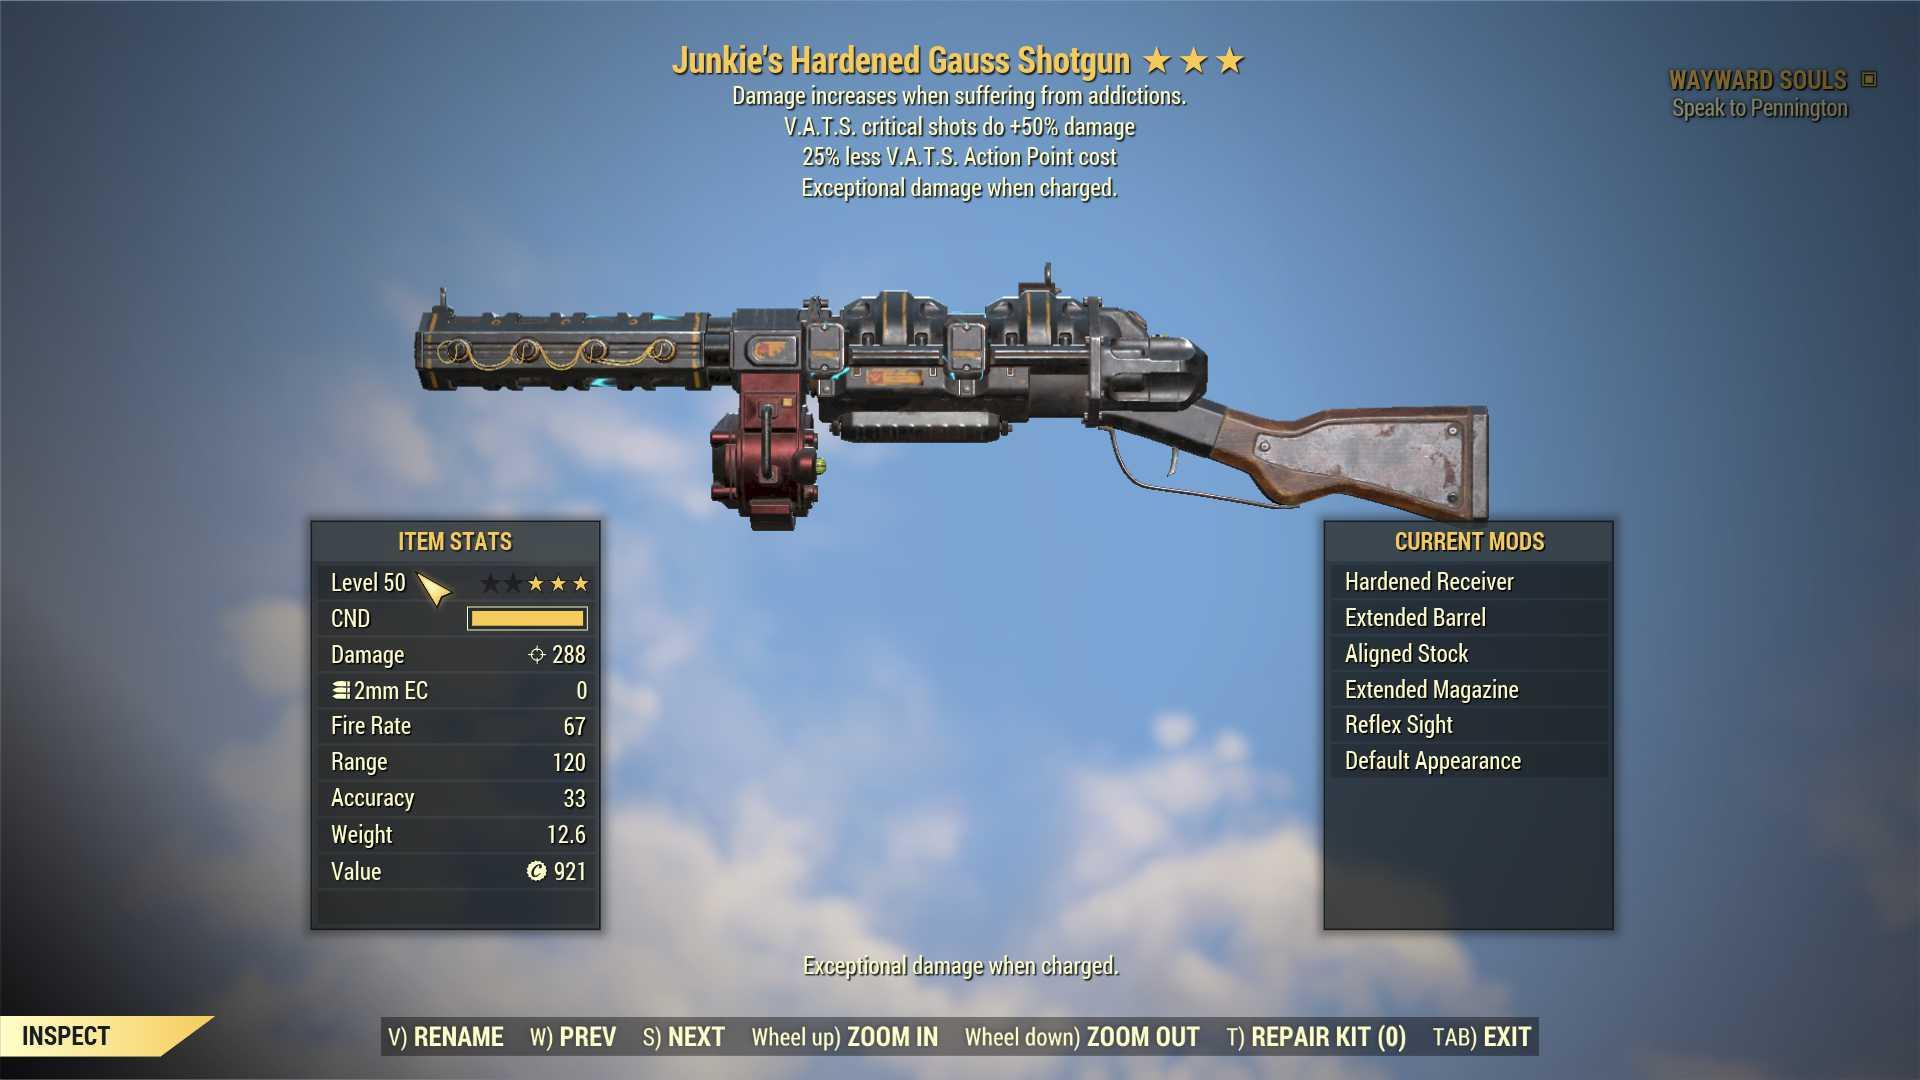 Junkie's Gauss Shotgun (+50% critical damage, 25% less VATS AP cost) FULL MODDED [Wastelanders]